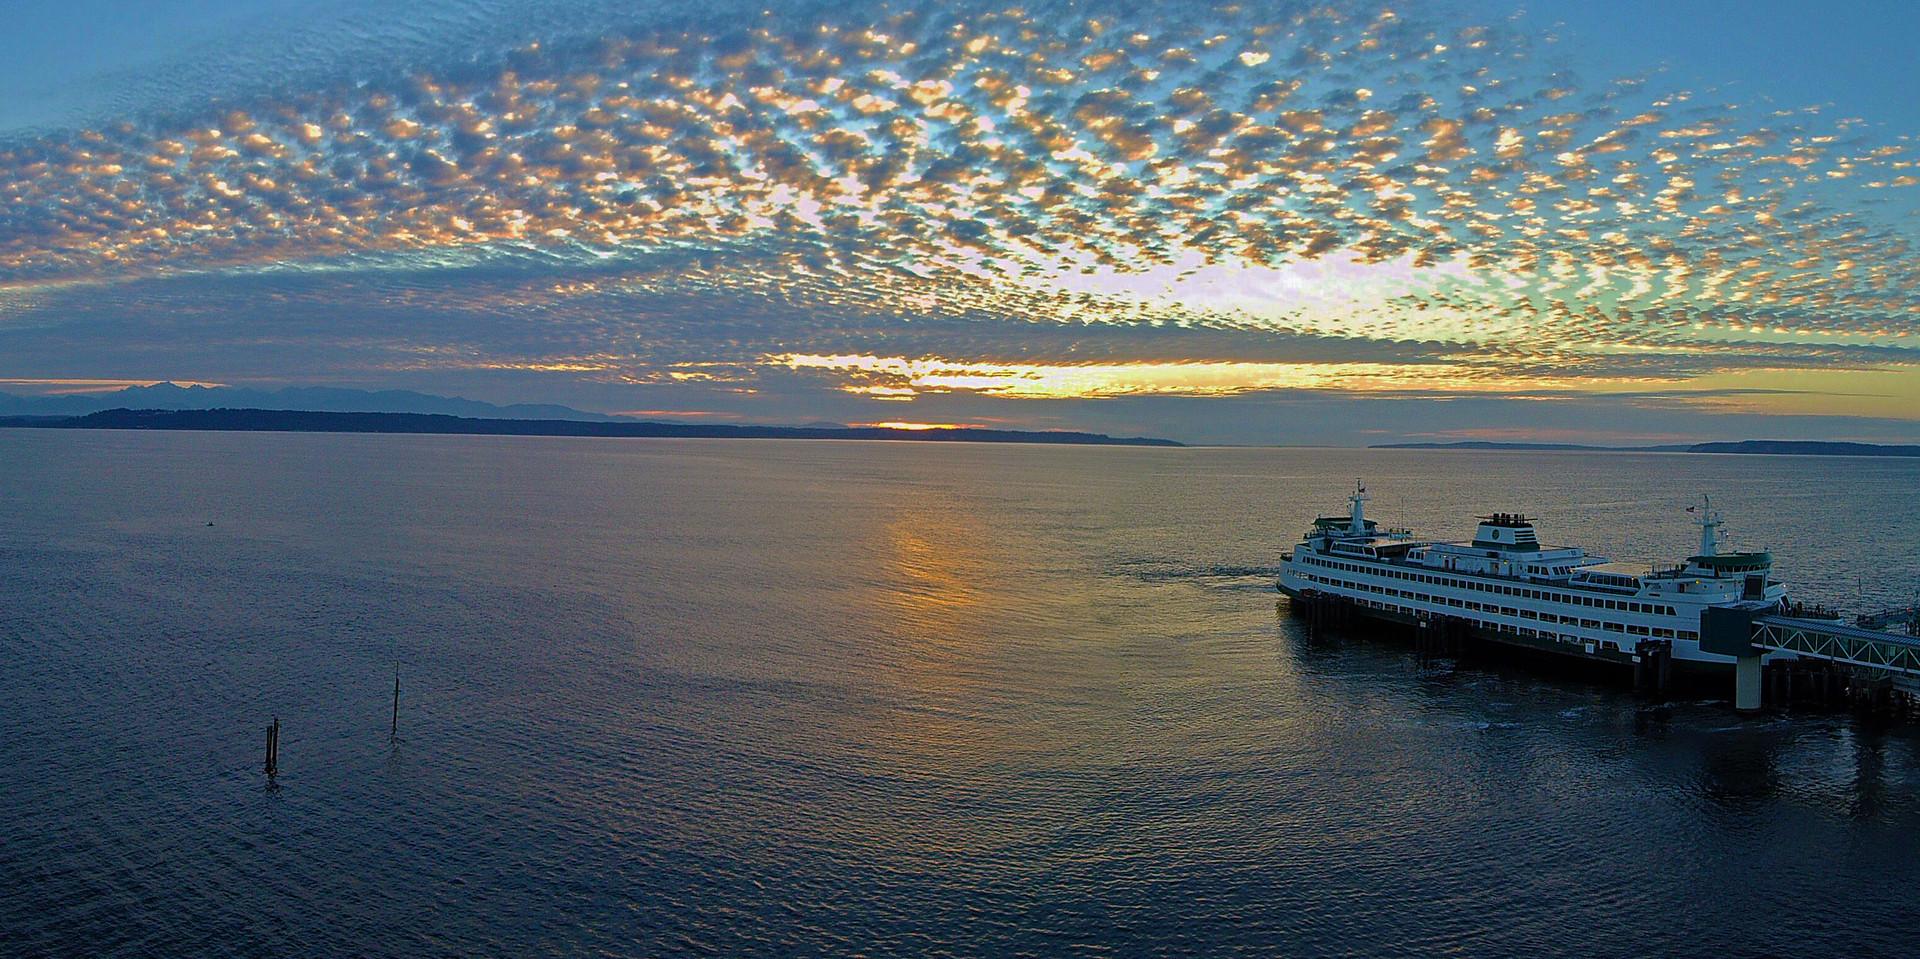 Western Washington - Edmonds Waterfront